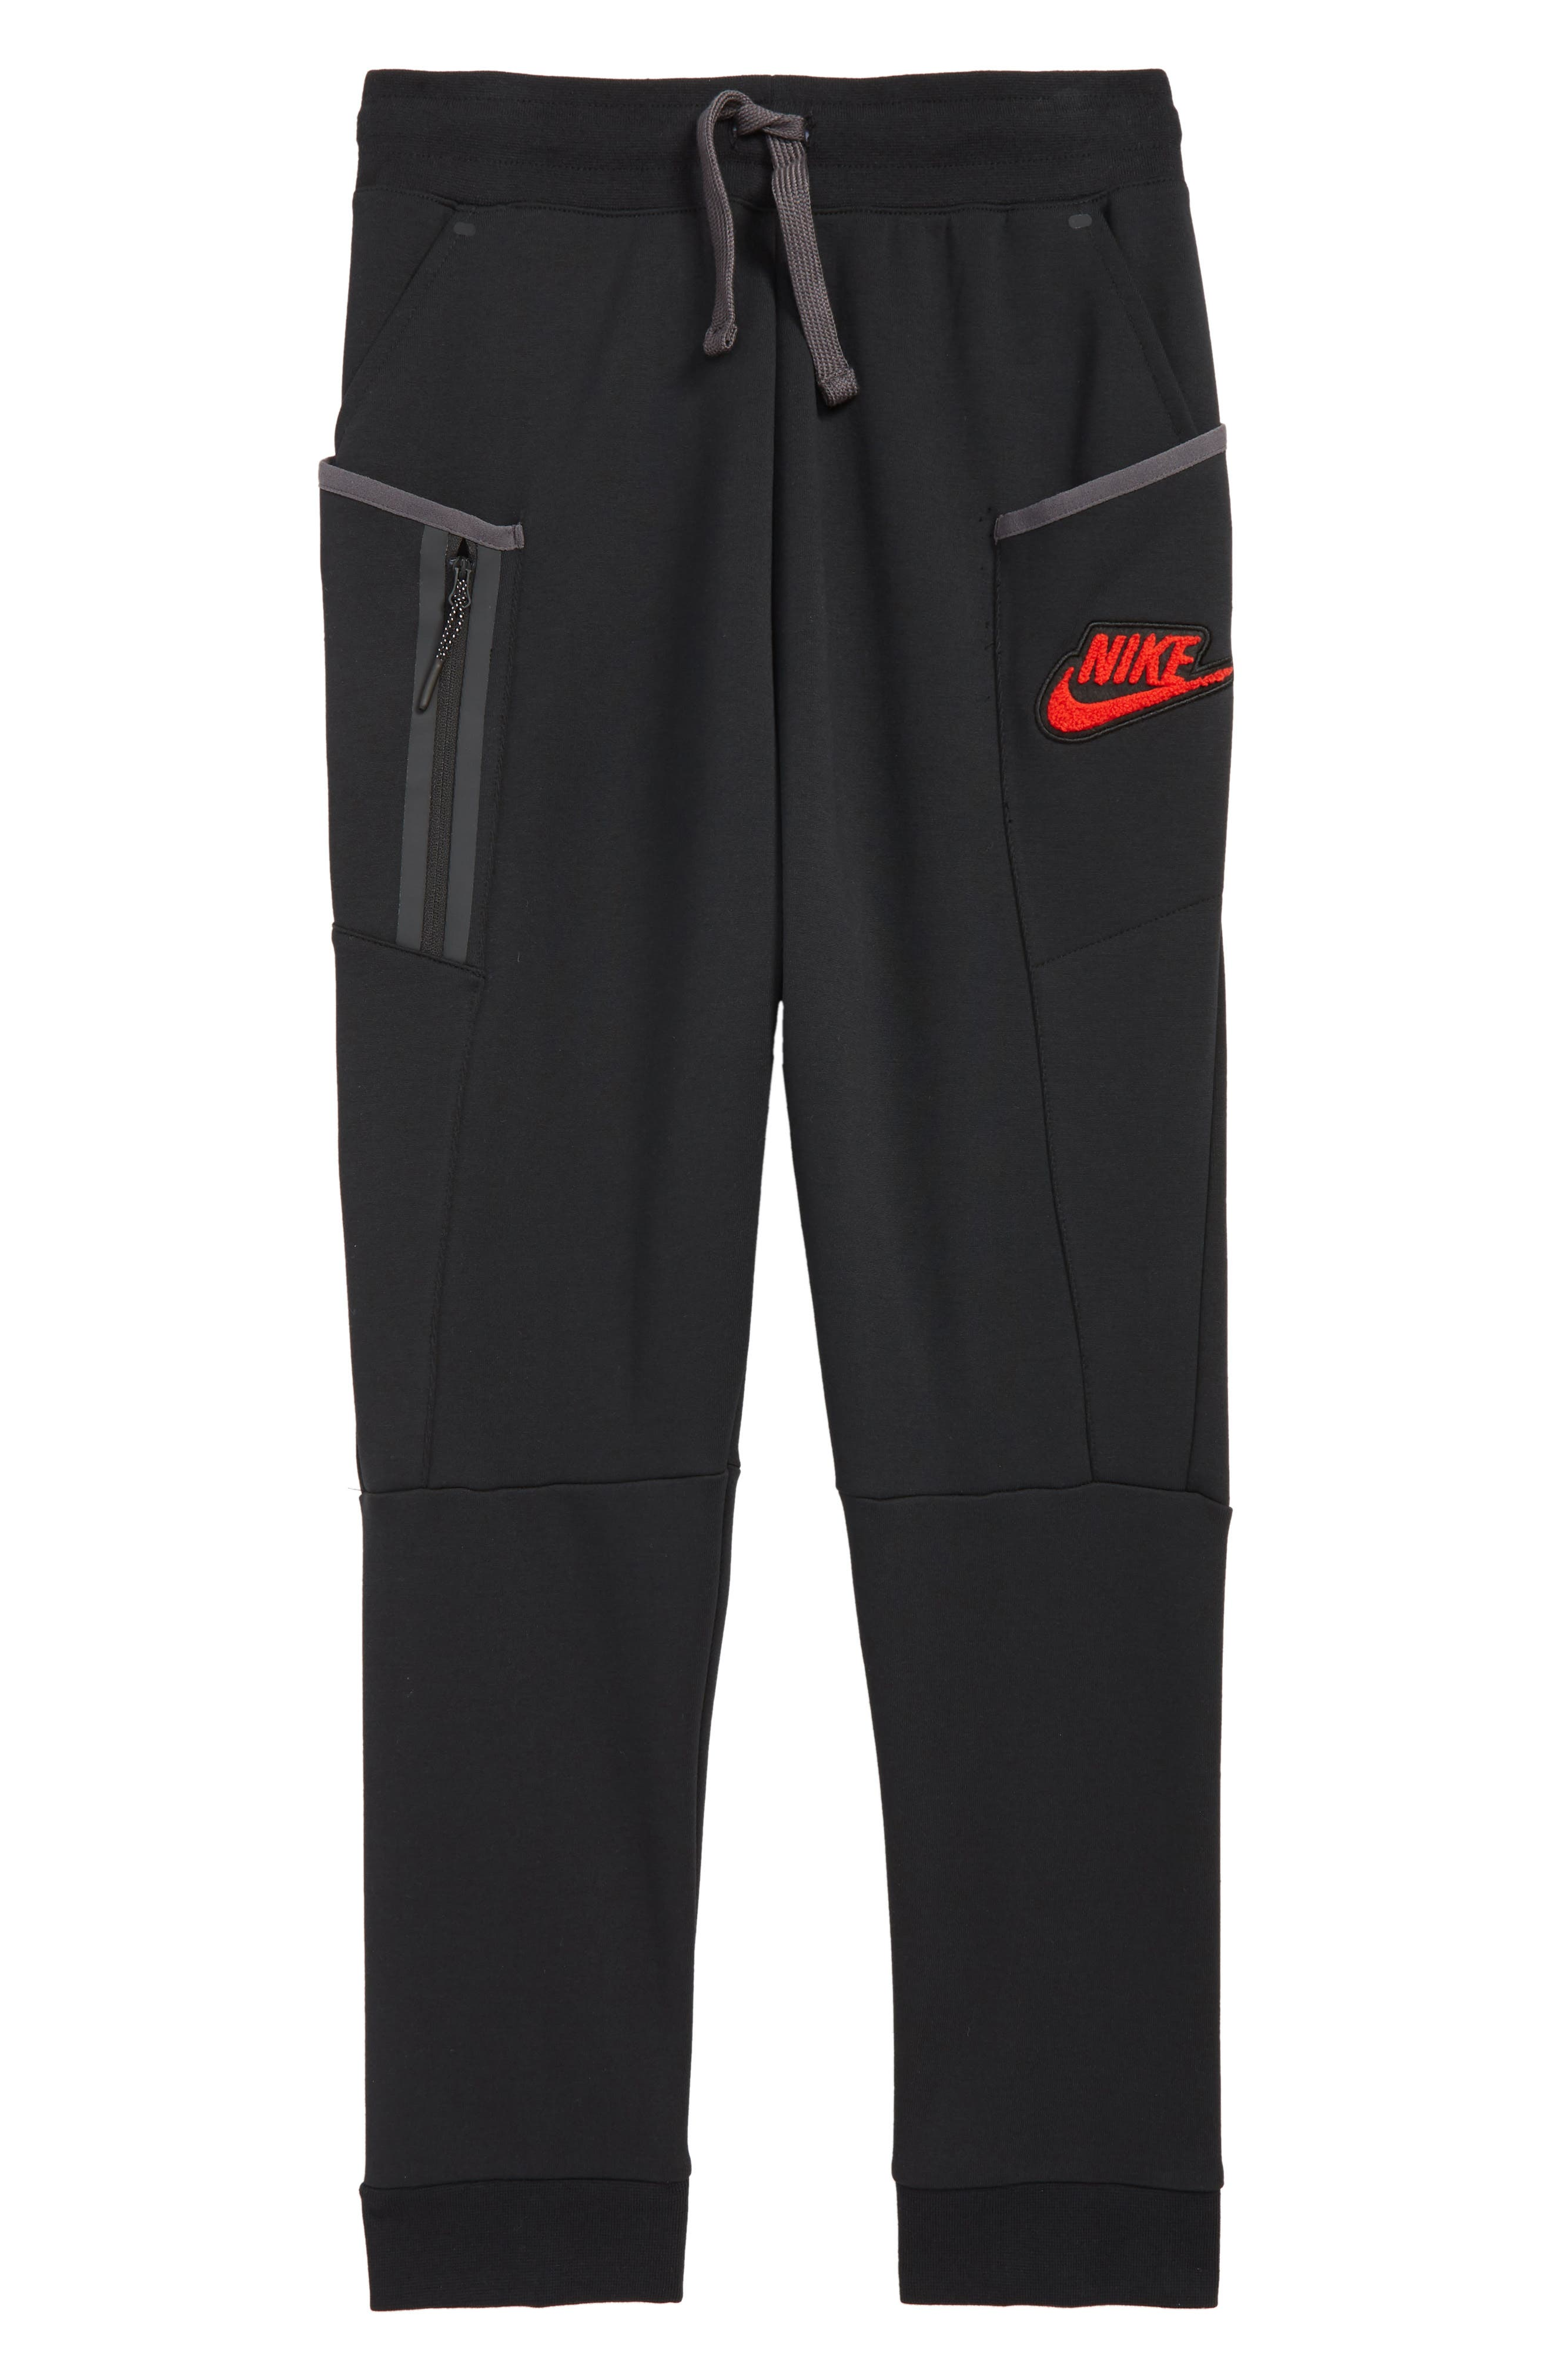 Sportswear Tech Fleece Pants, Main, color, BLACK/ THUNDER GREY